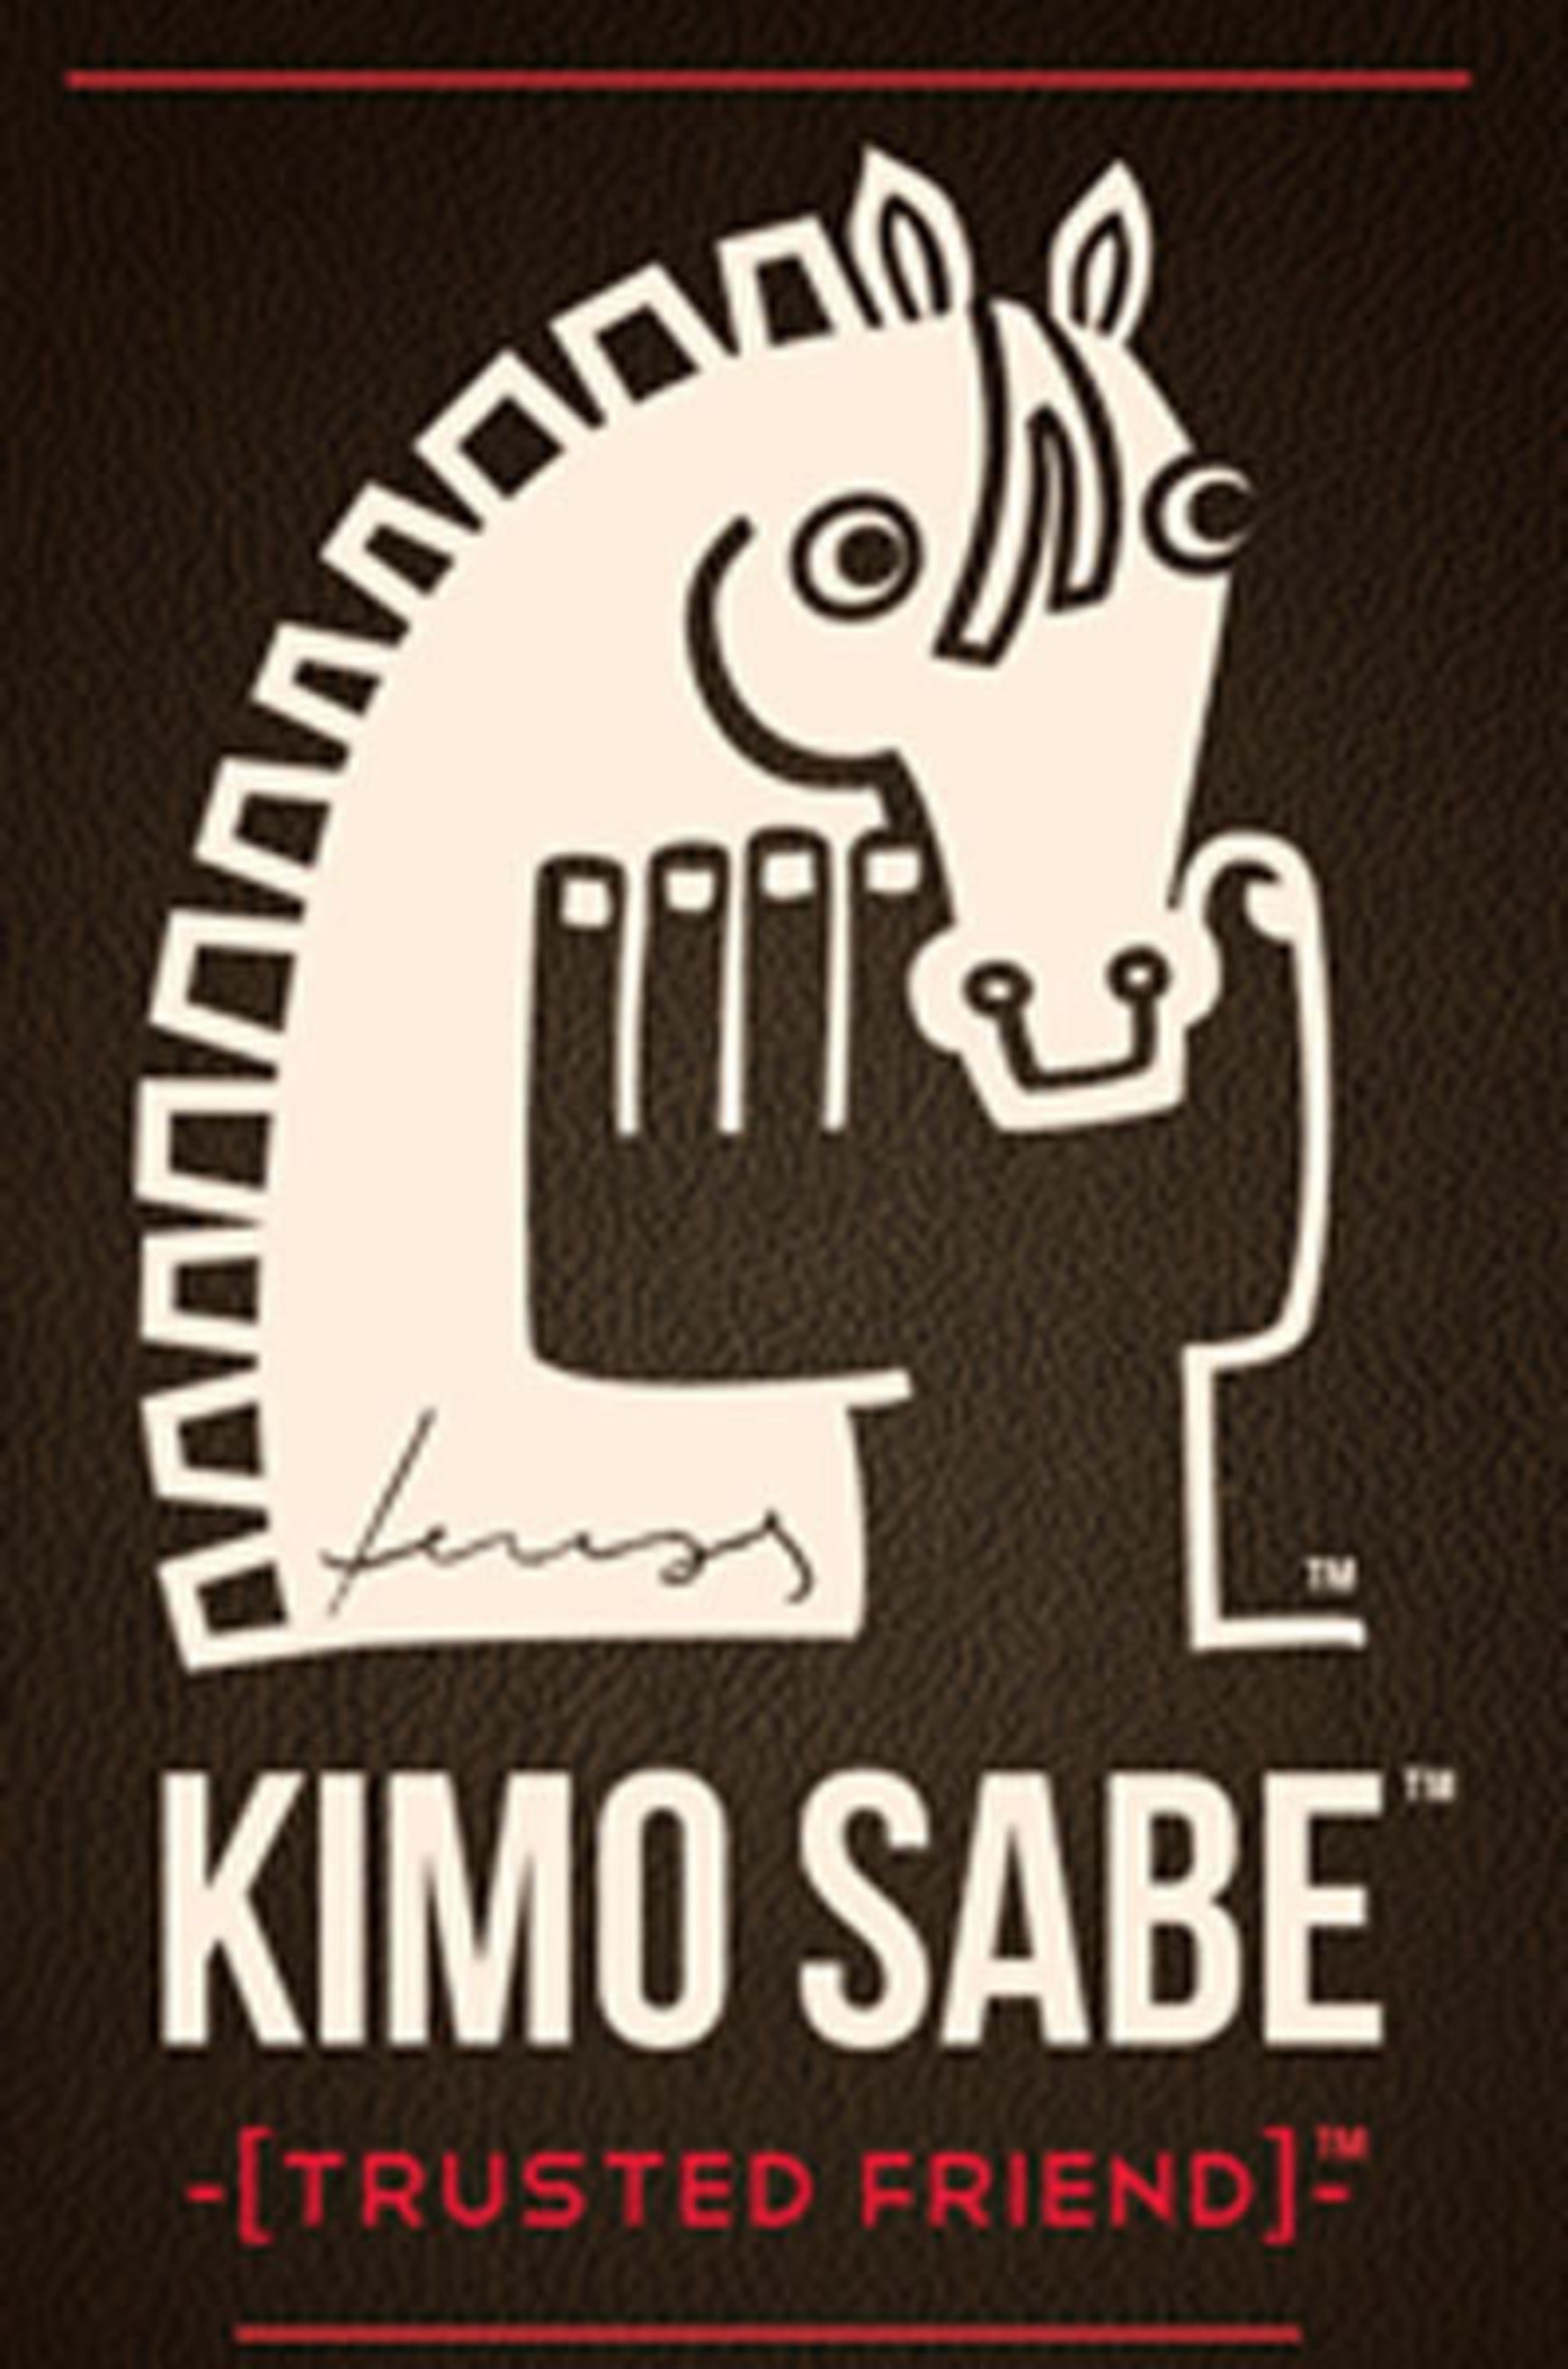 Kimo Sabe Mezcal Logo